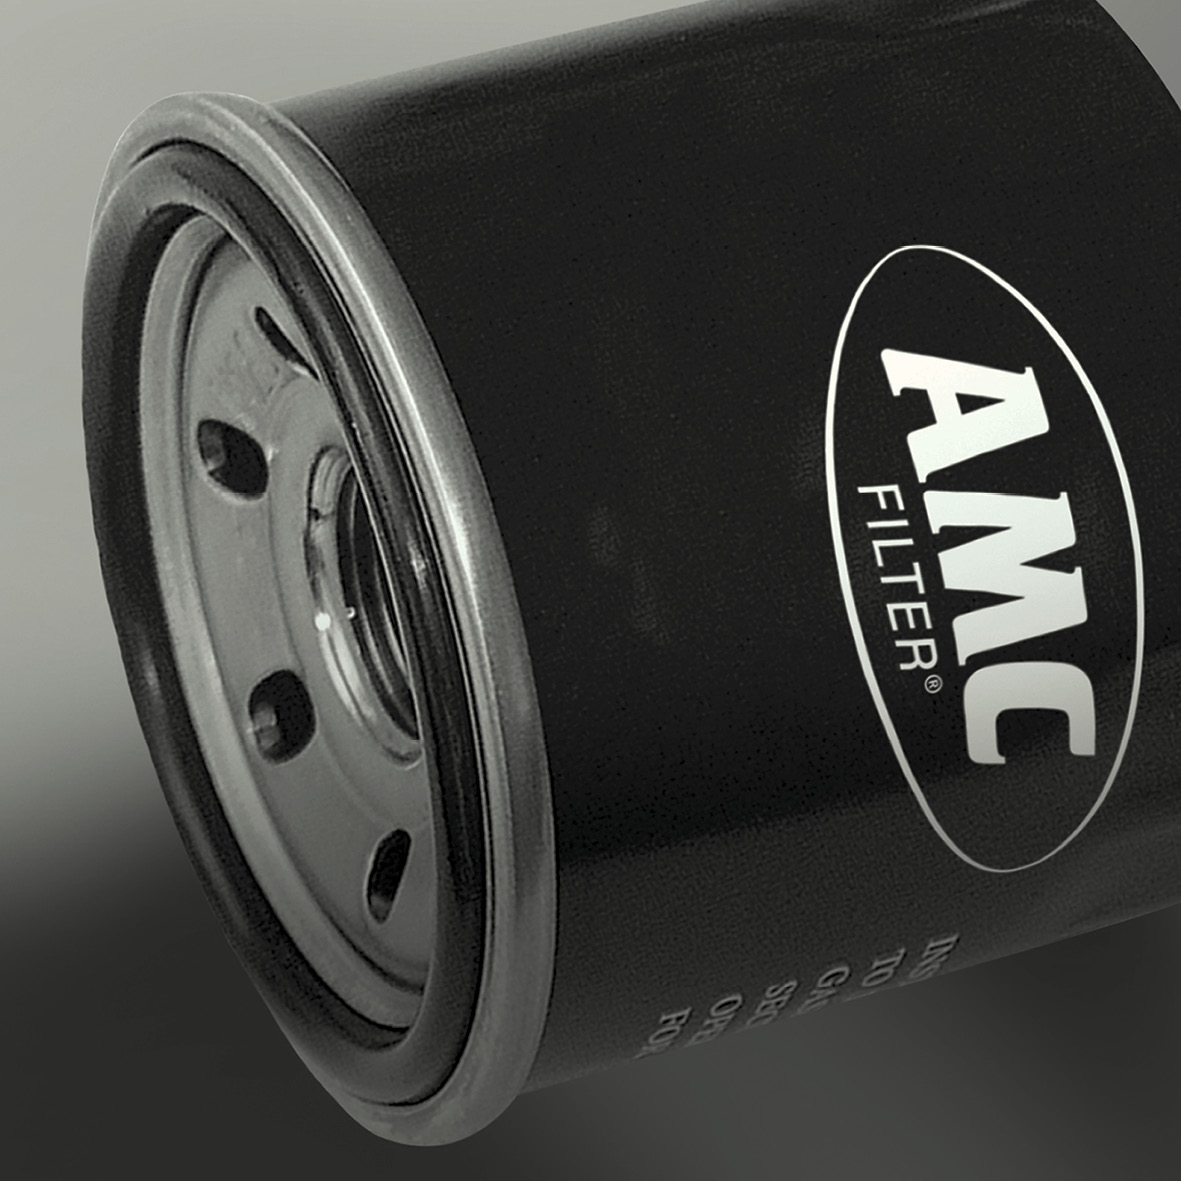 Aftermarket AMC Filters